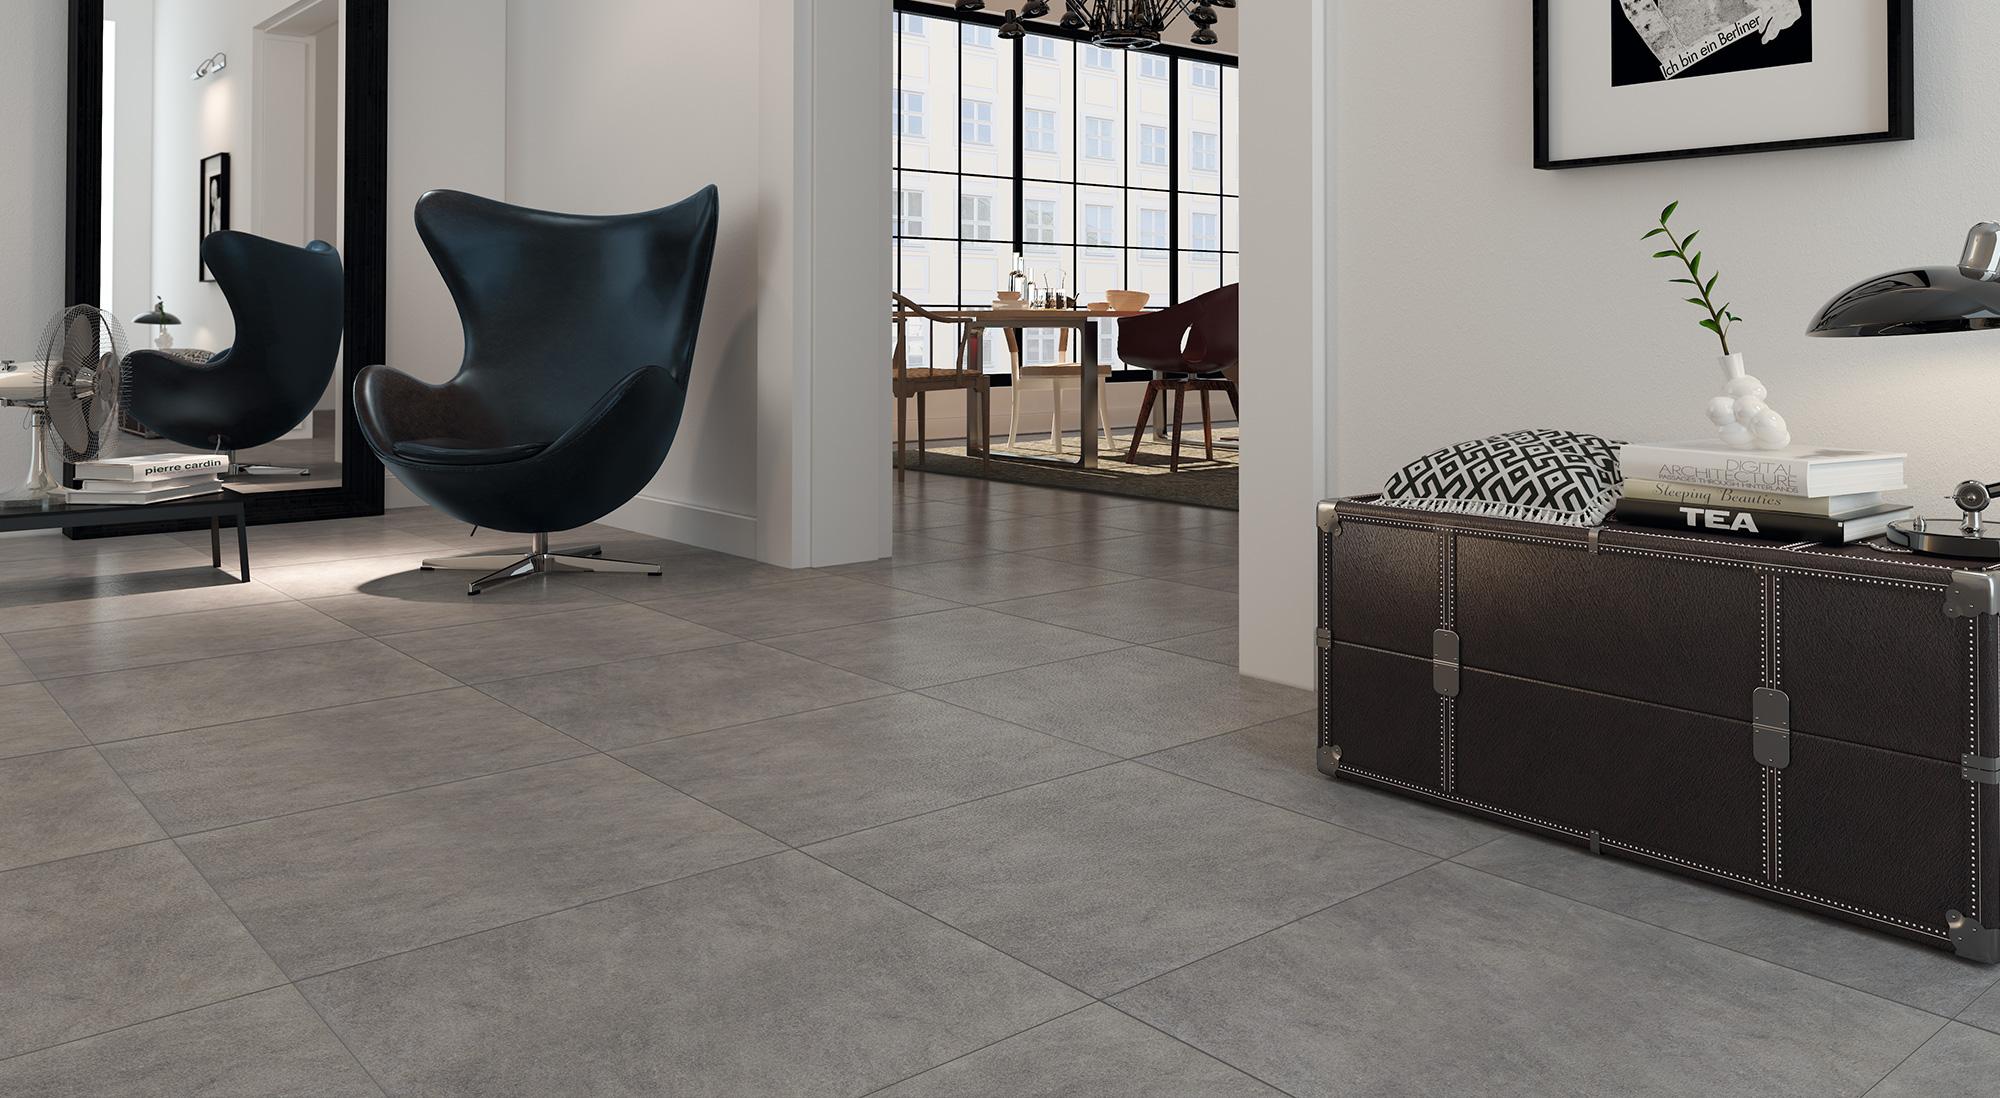 Meissen Keramik GmbH: Dry River